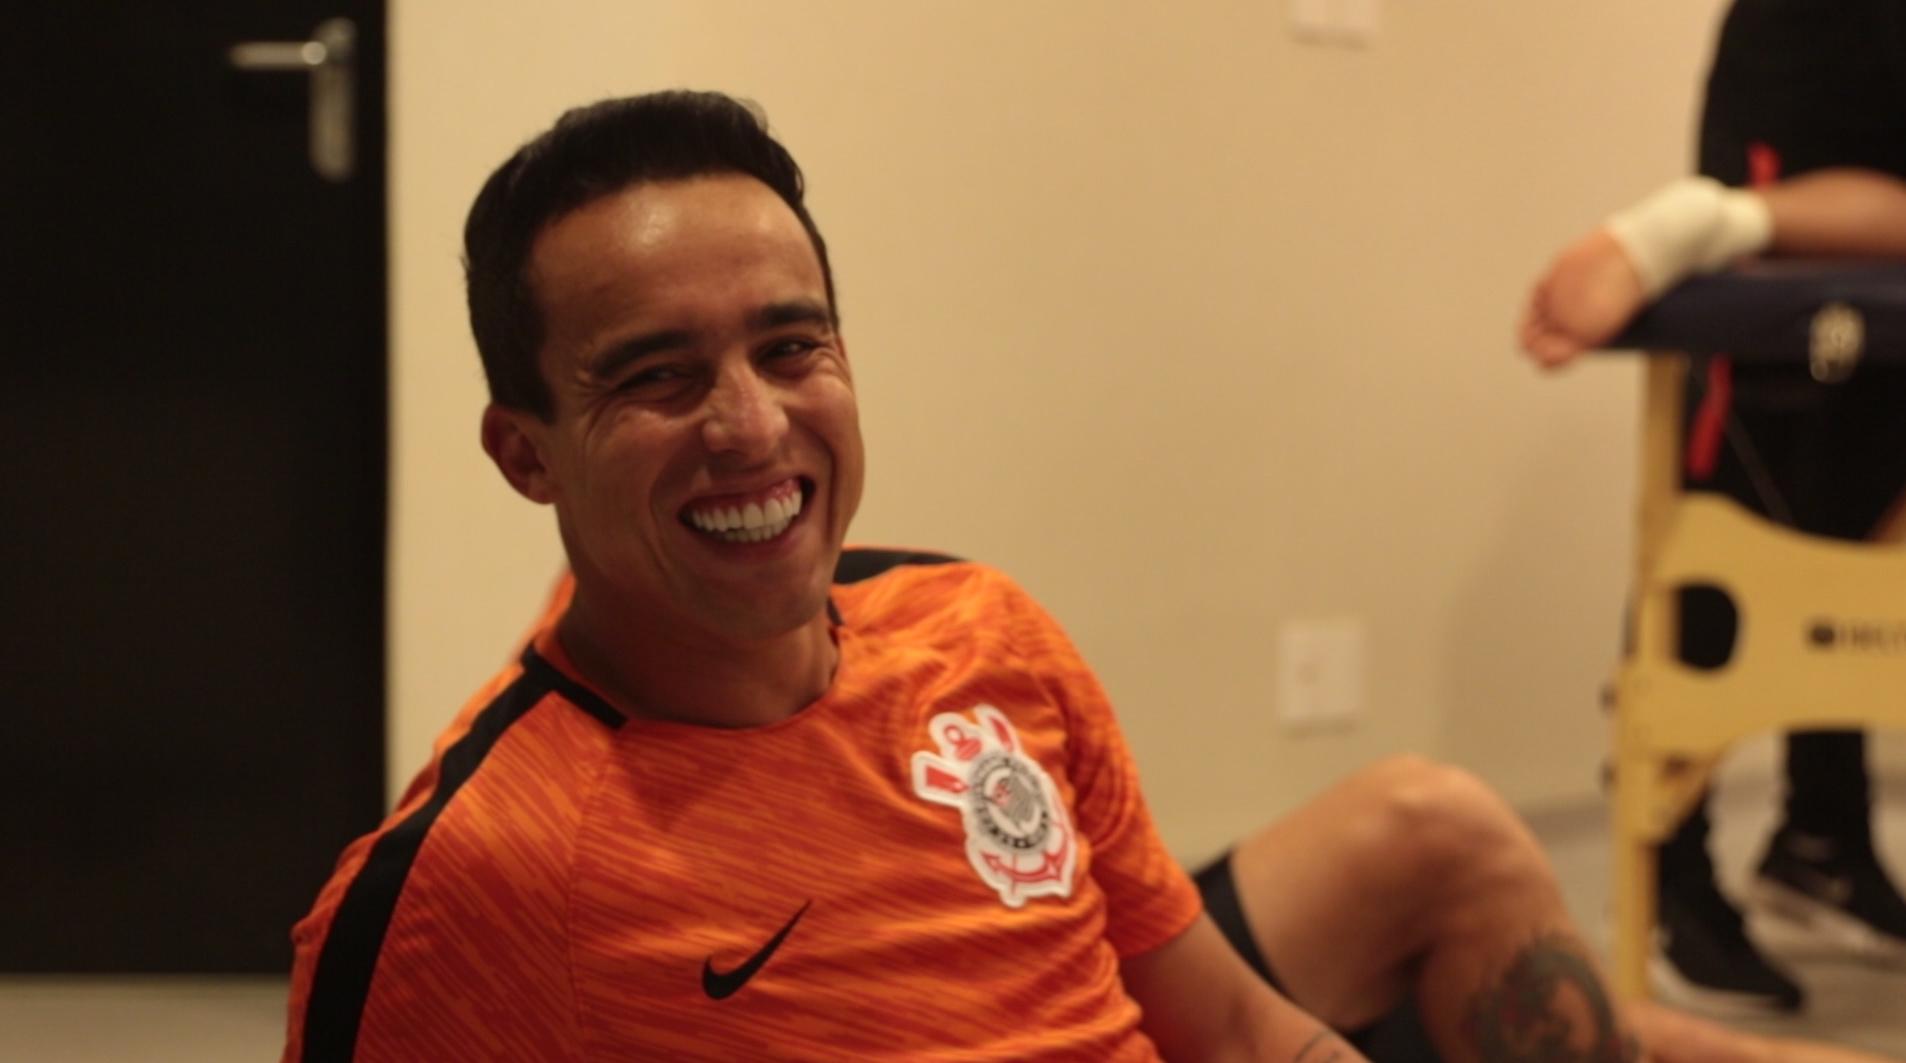 Bastidores - Corinthians 1x0 Chapecoense - Quartas de Final Copa do Brasil